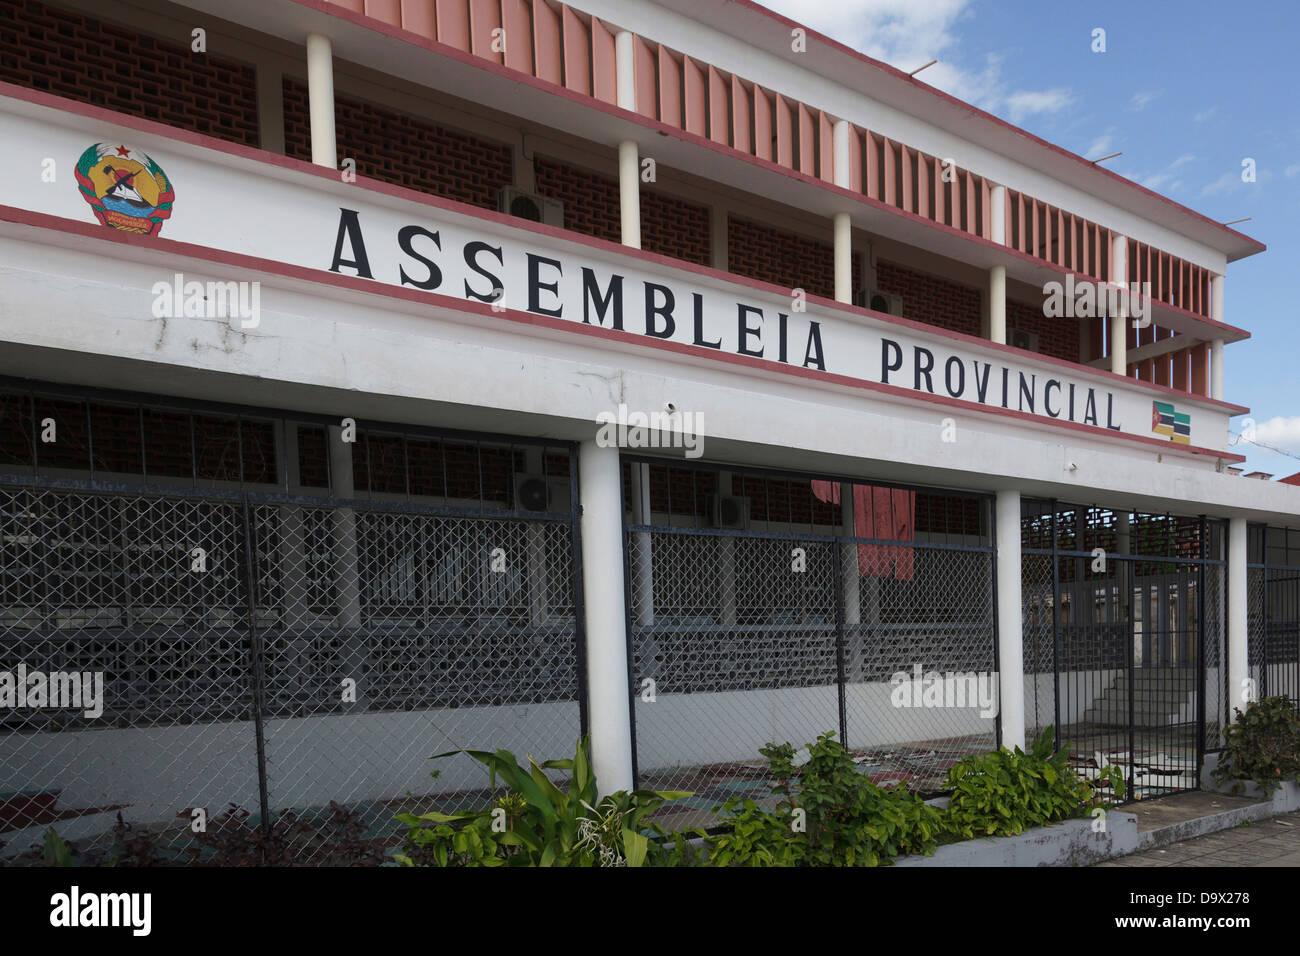 Africa, Mozambique, Inhambane. Provincial Assembly. - Stock Image